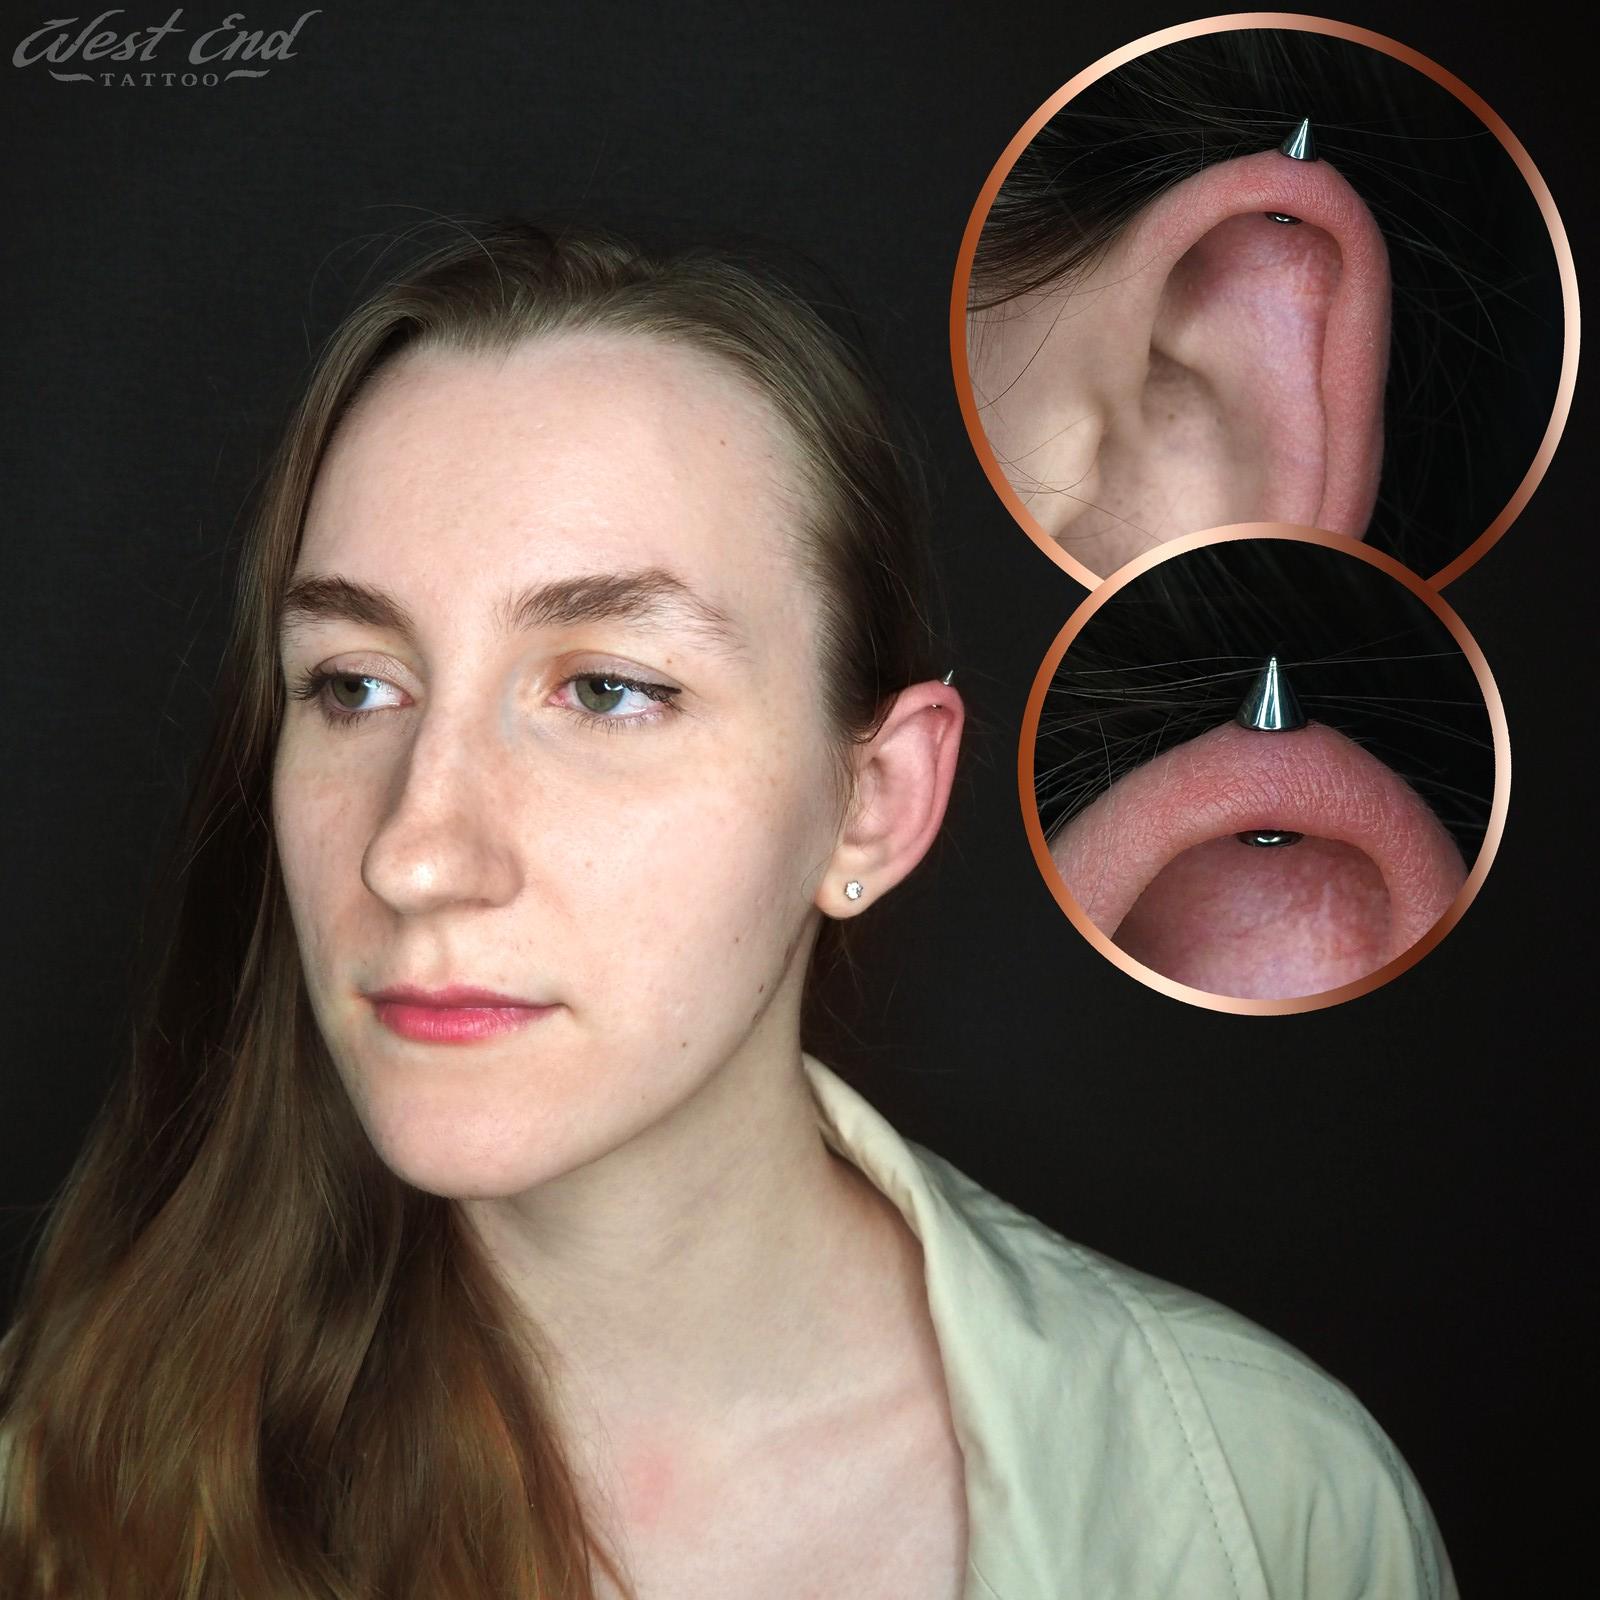 Пирсинг хряща уха